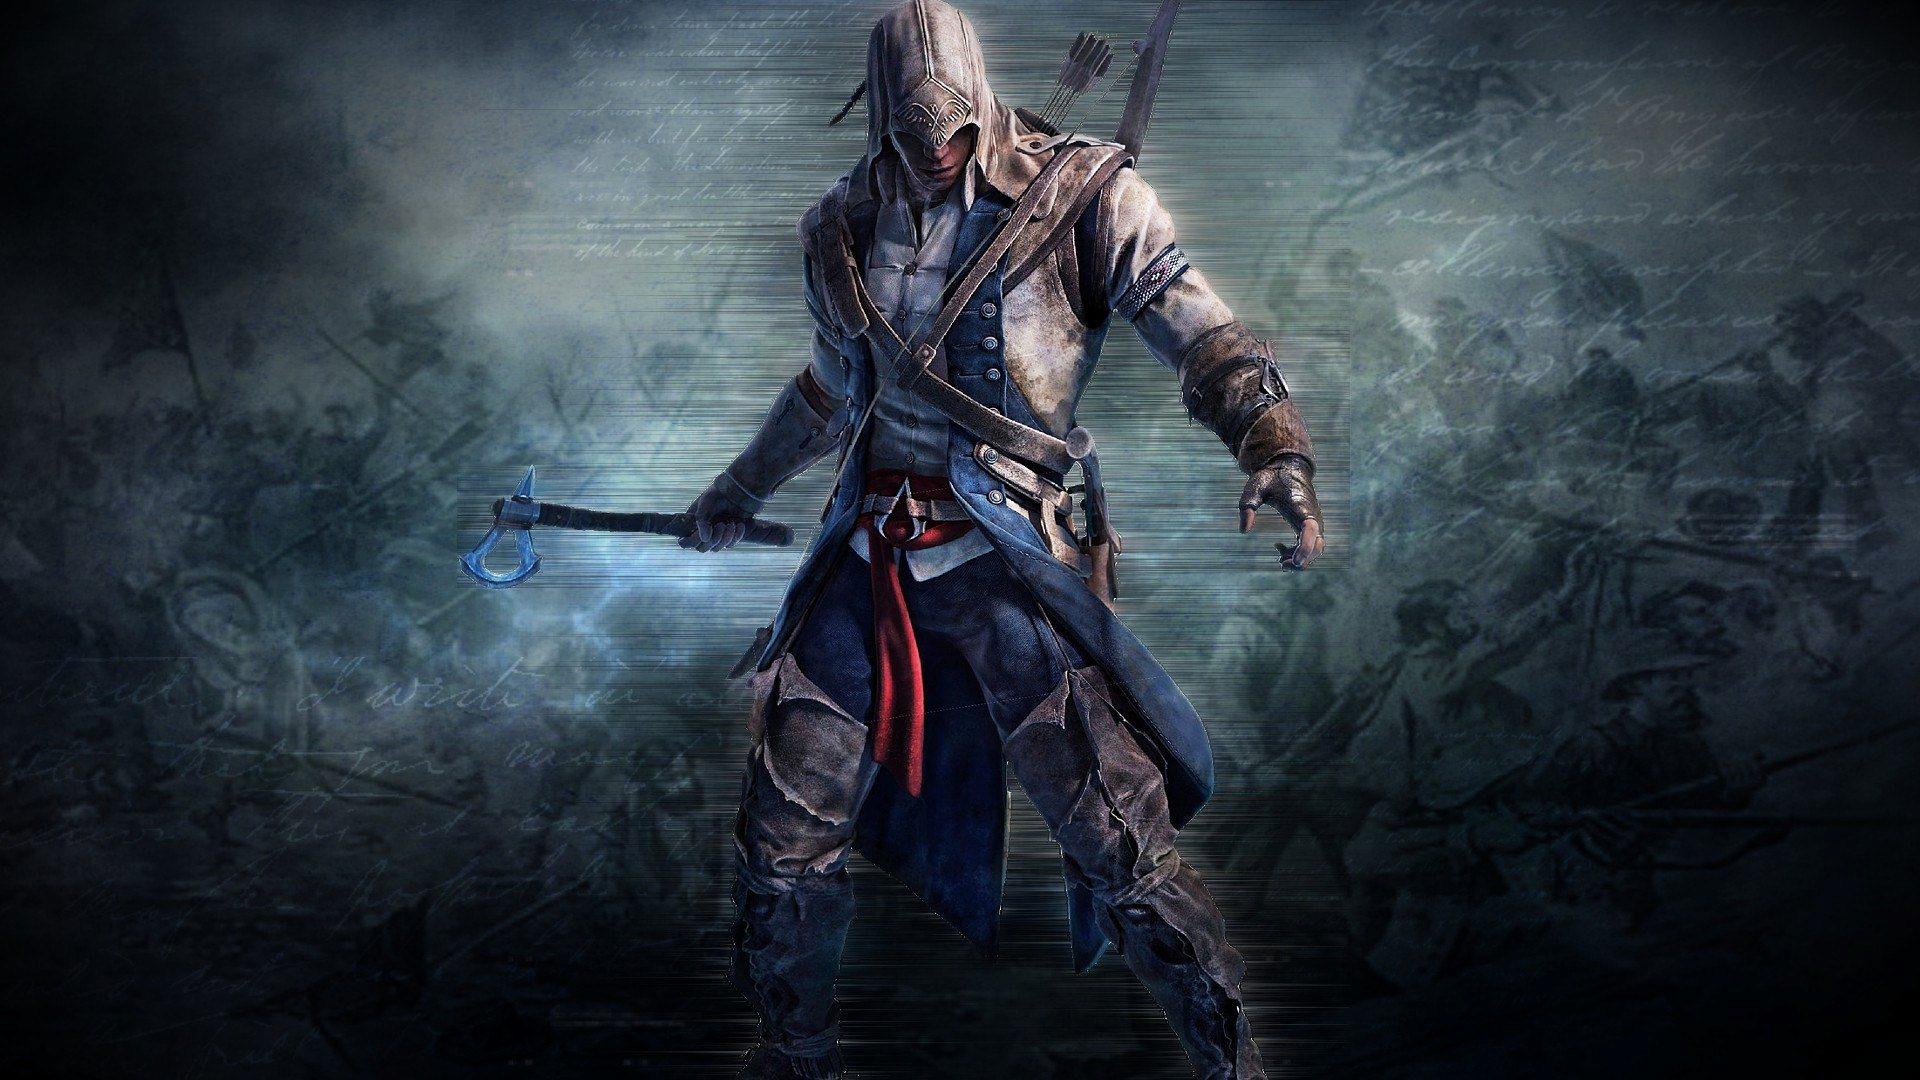 Assassins Creed 3 Game Wallpaper Hd Wallpaper Background